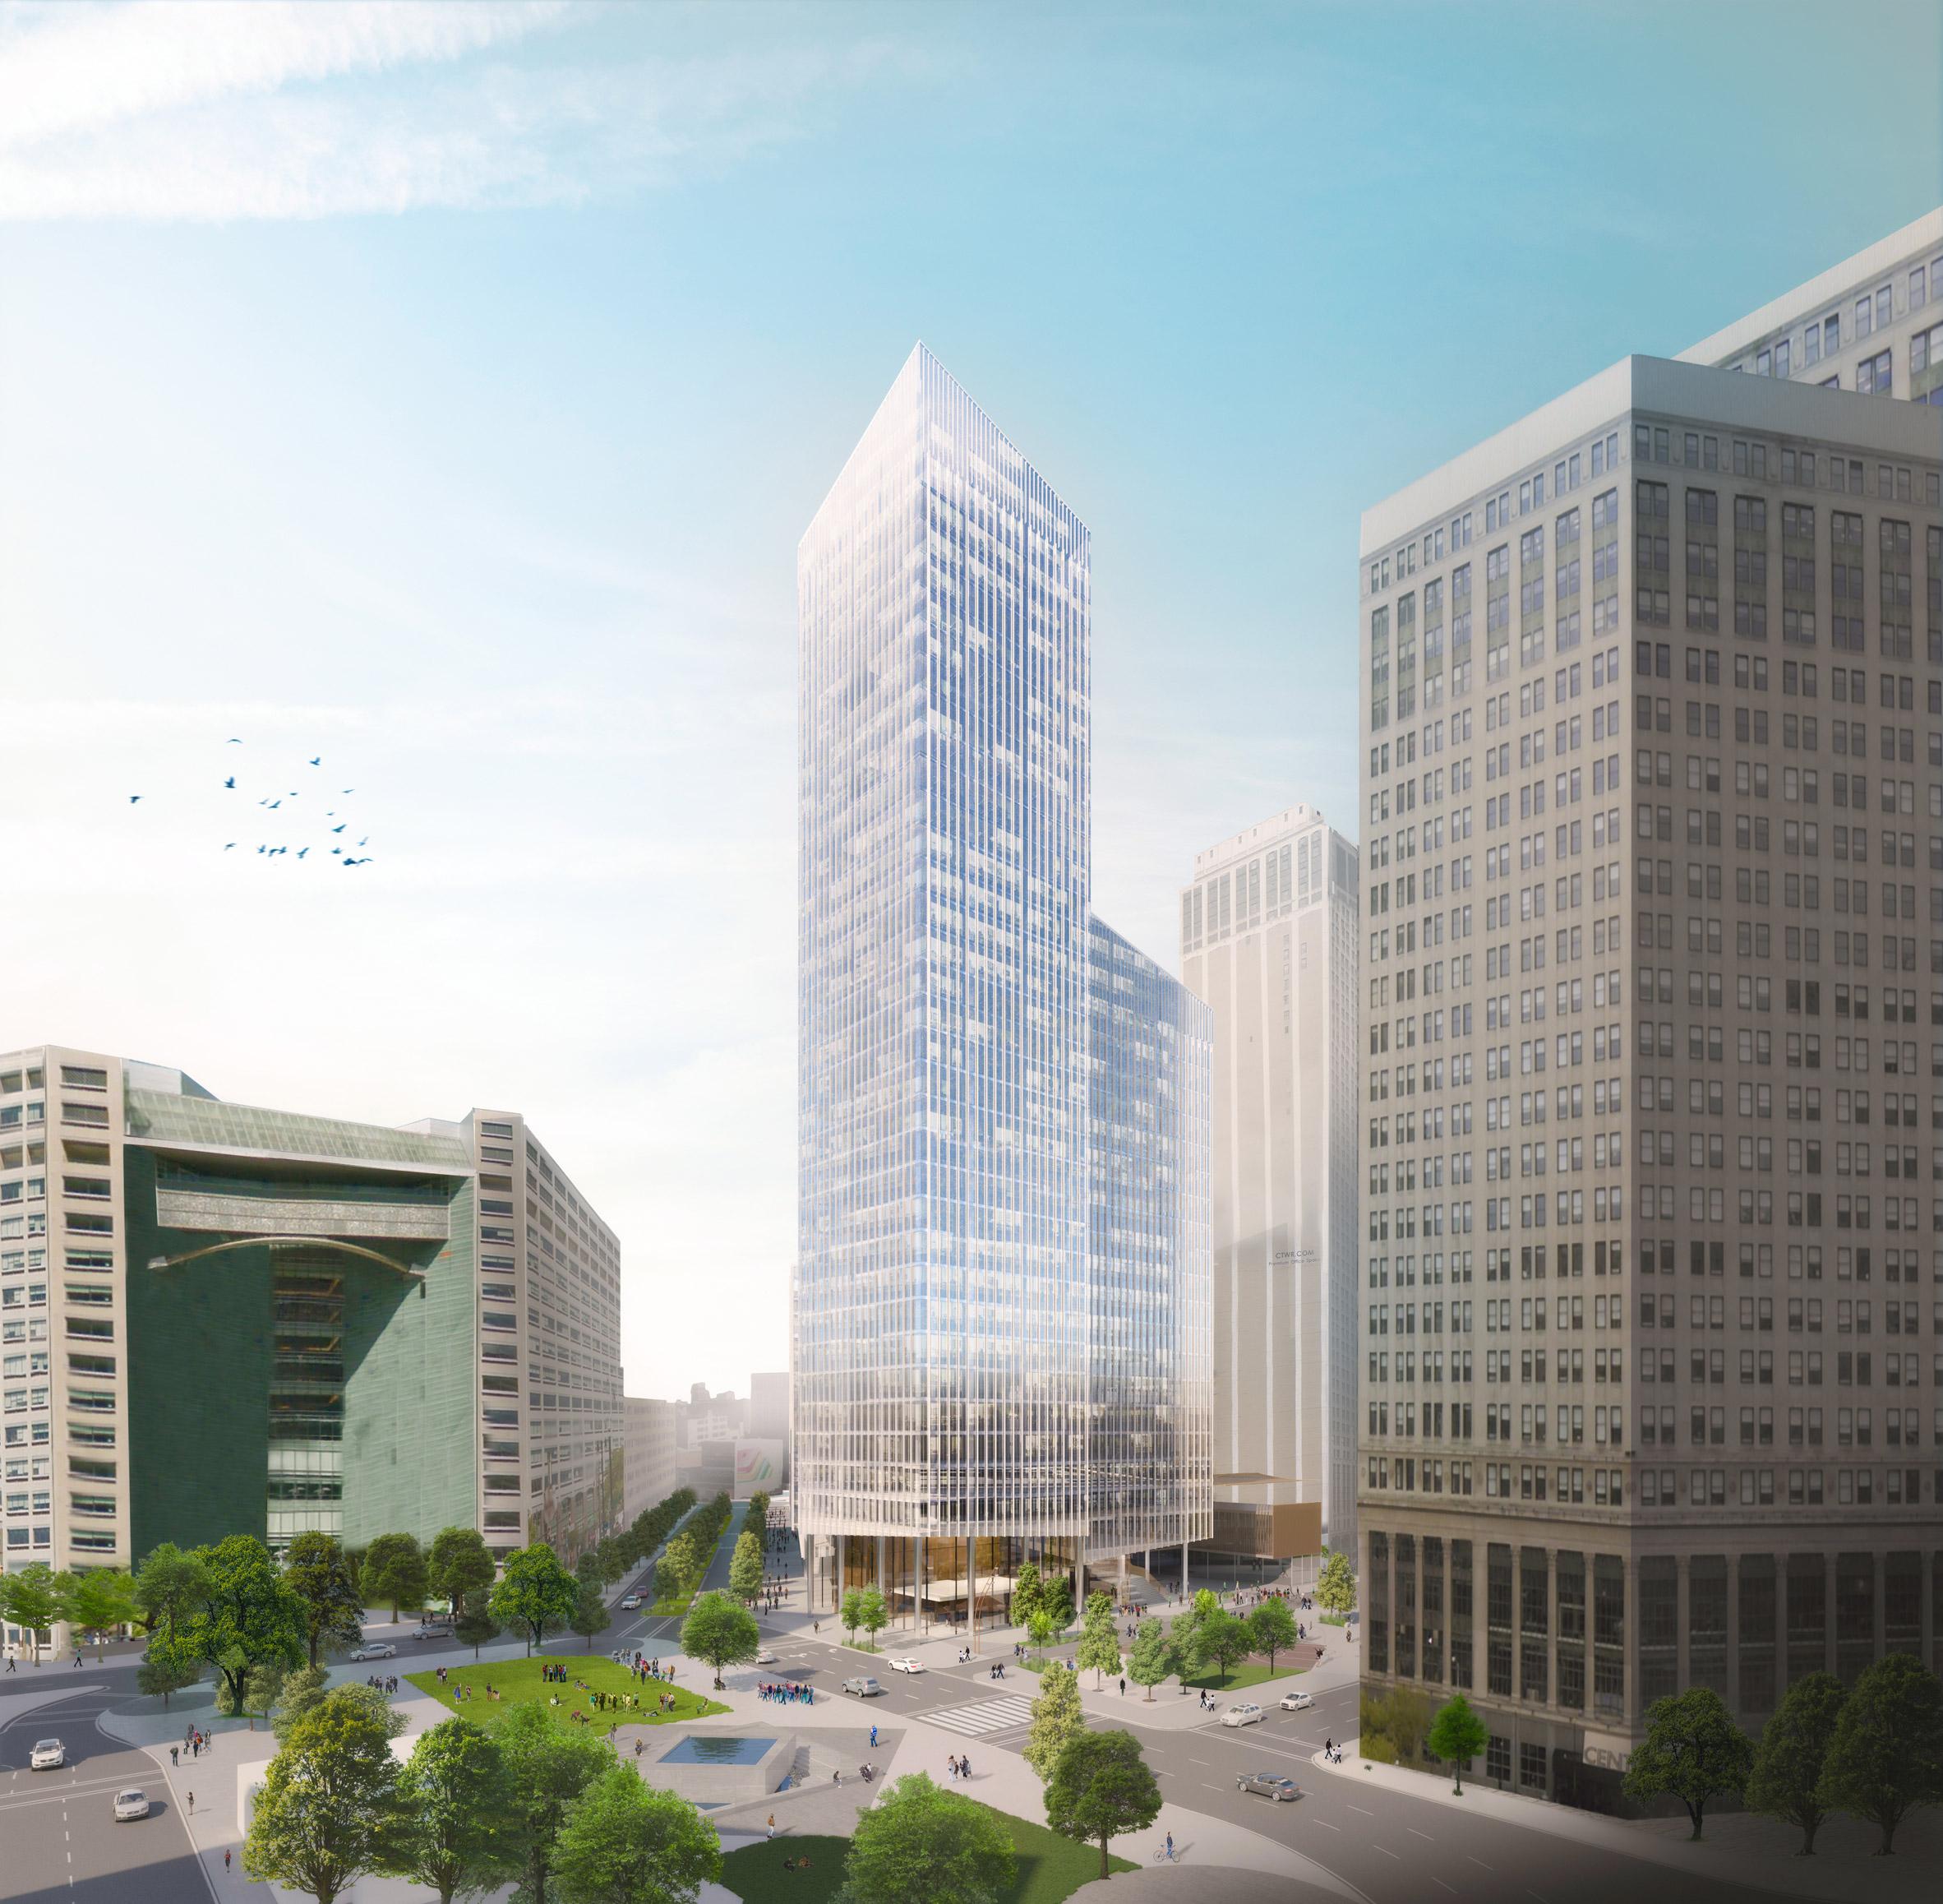 Schmidt Hammer Lassen reveals plans for Monroe Blocks development in downtown Detroit